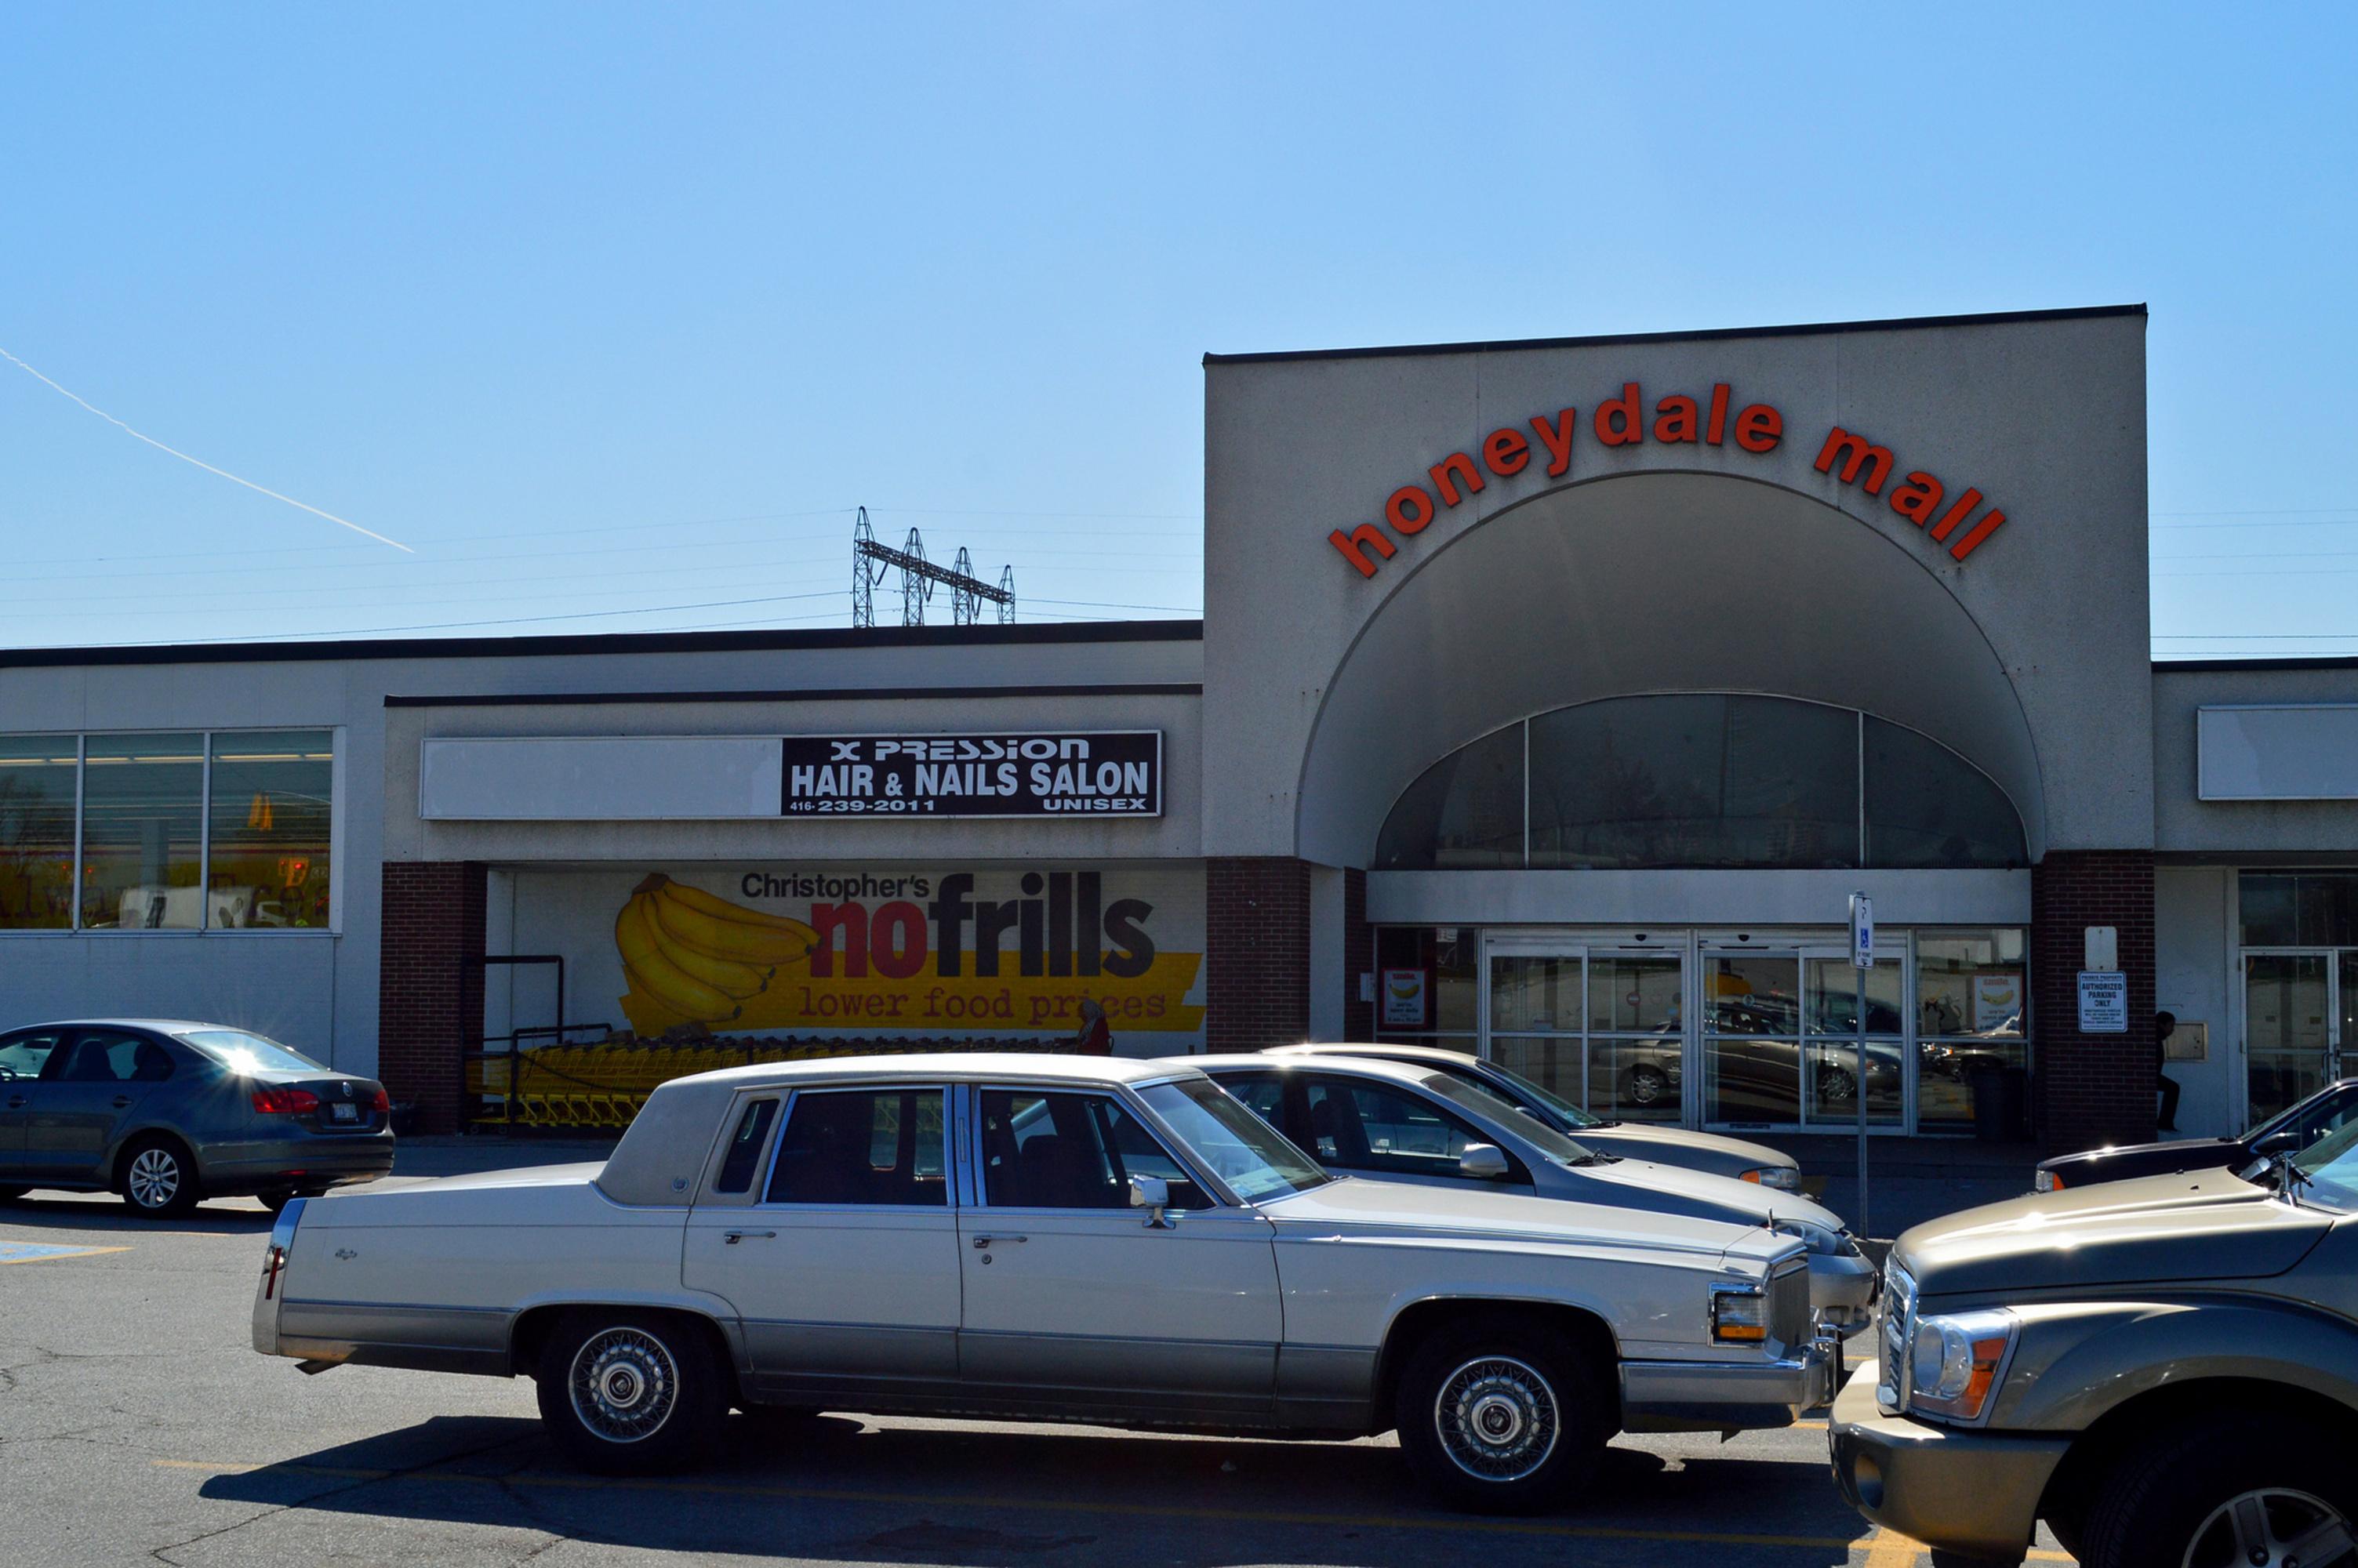 honeydale mall